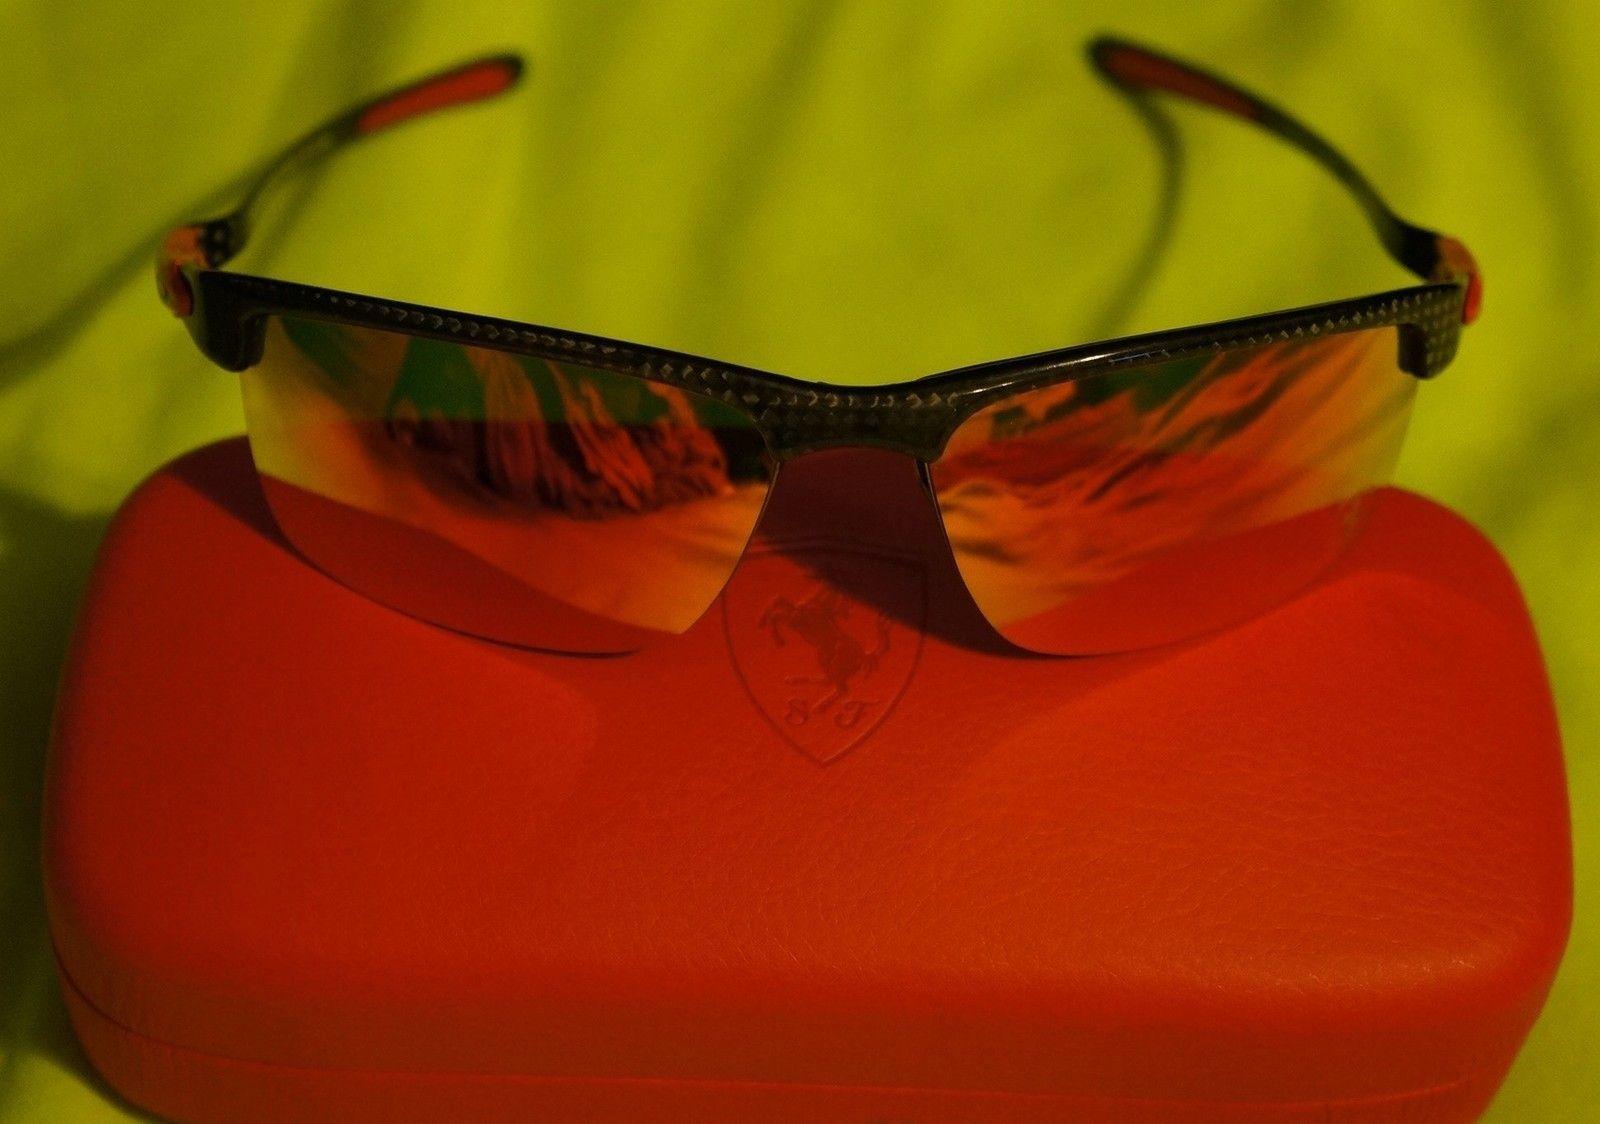 Ferrari Carbon Blades - BNIB - $OLD! - Xt4edm.jpg